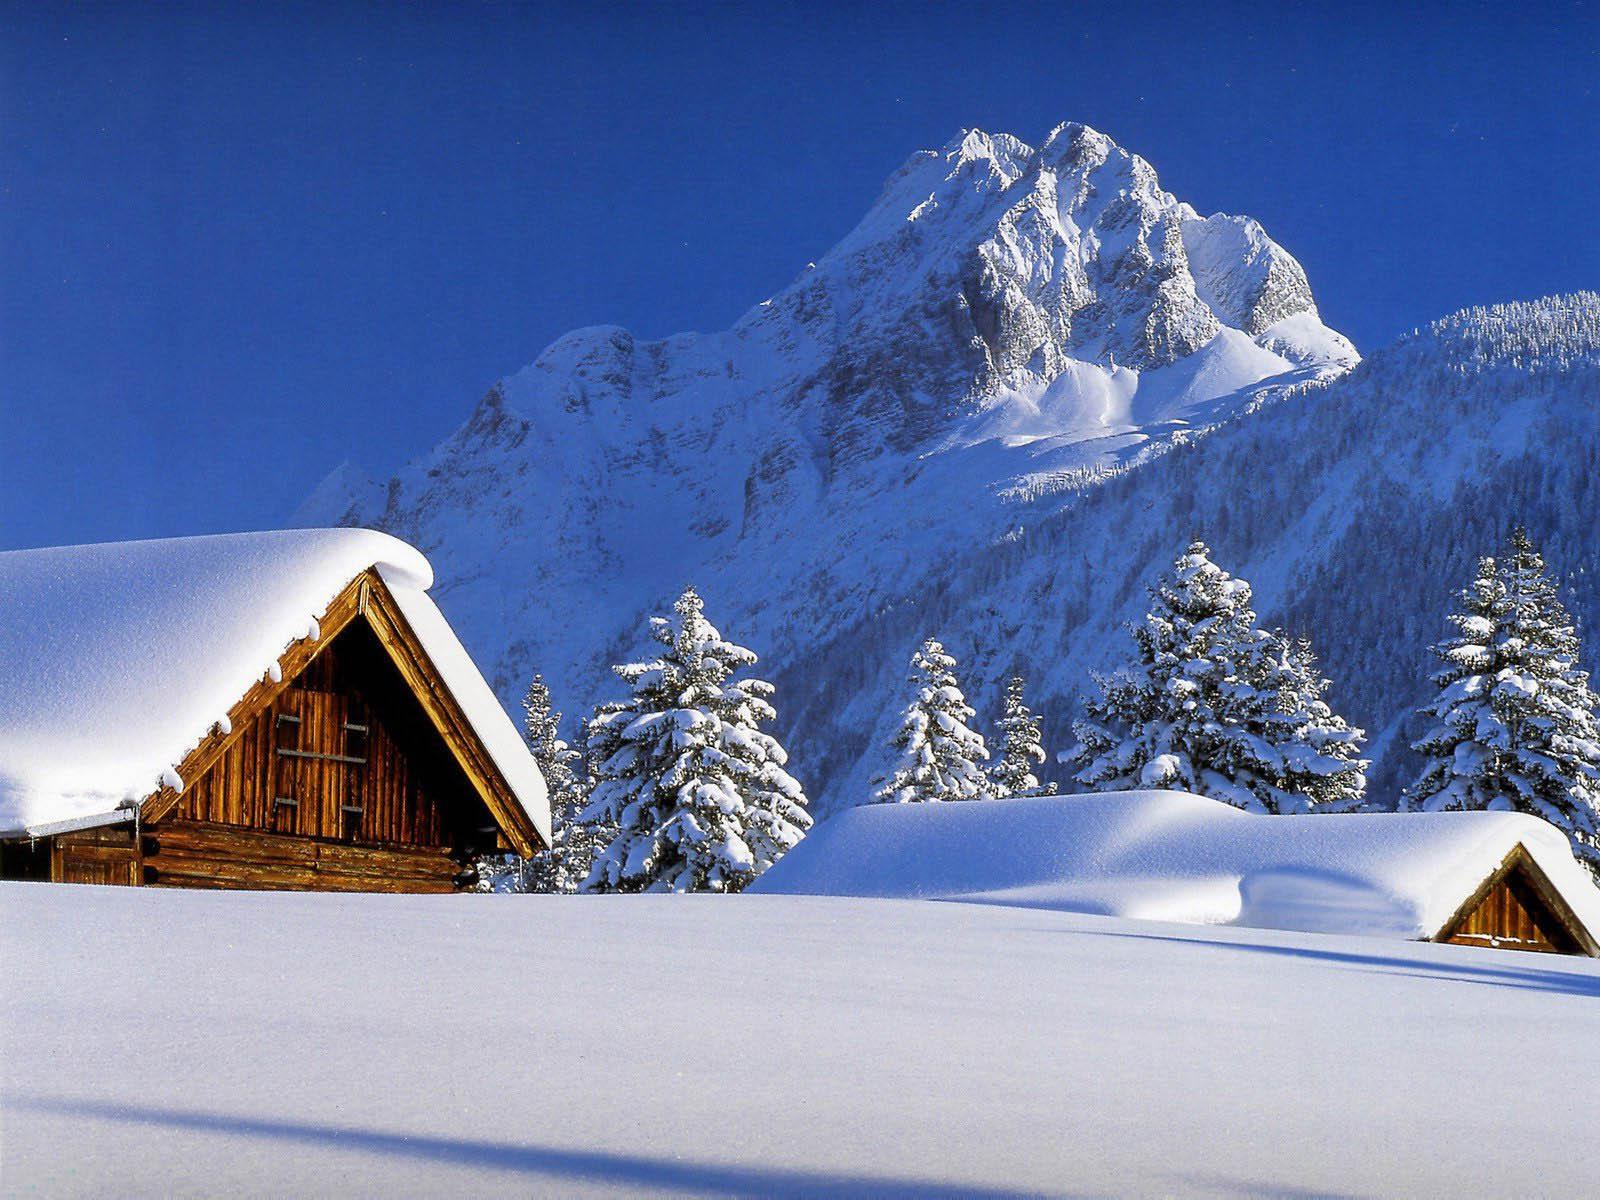 snow wallpaper download